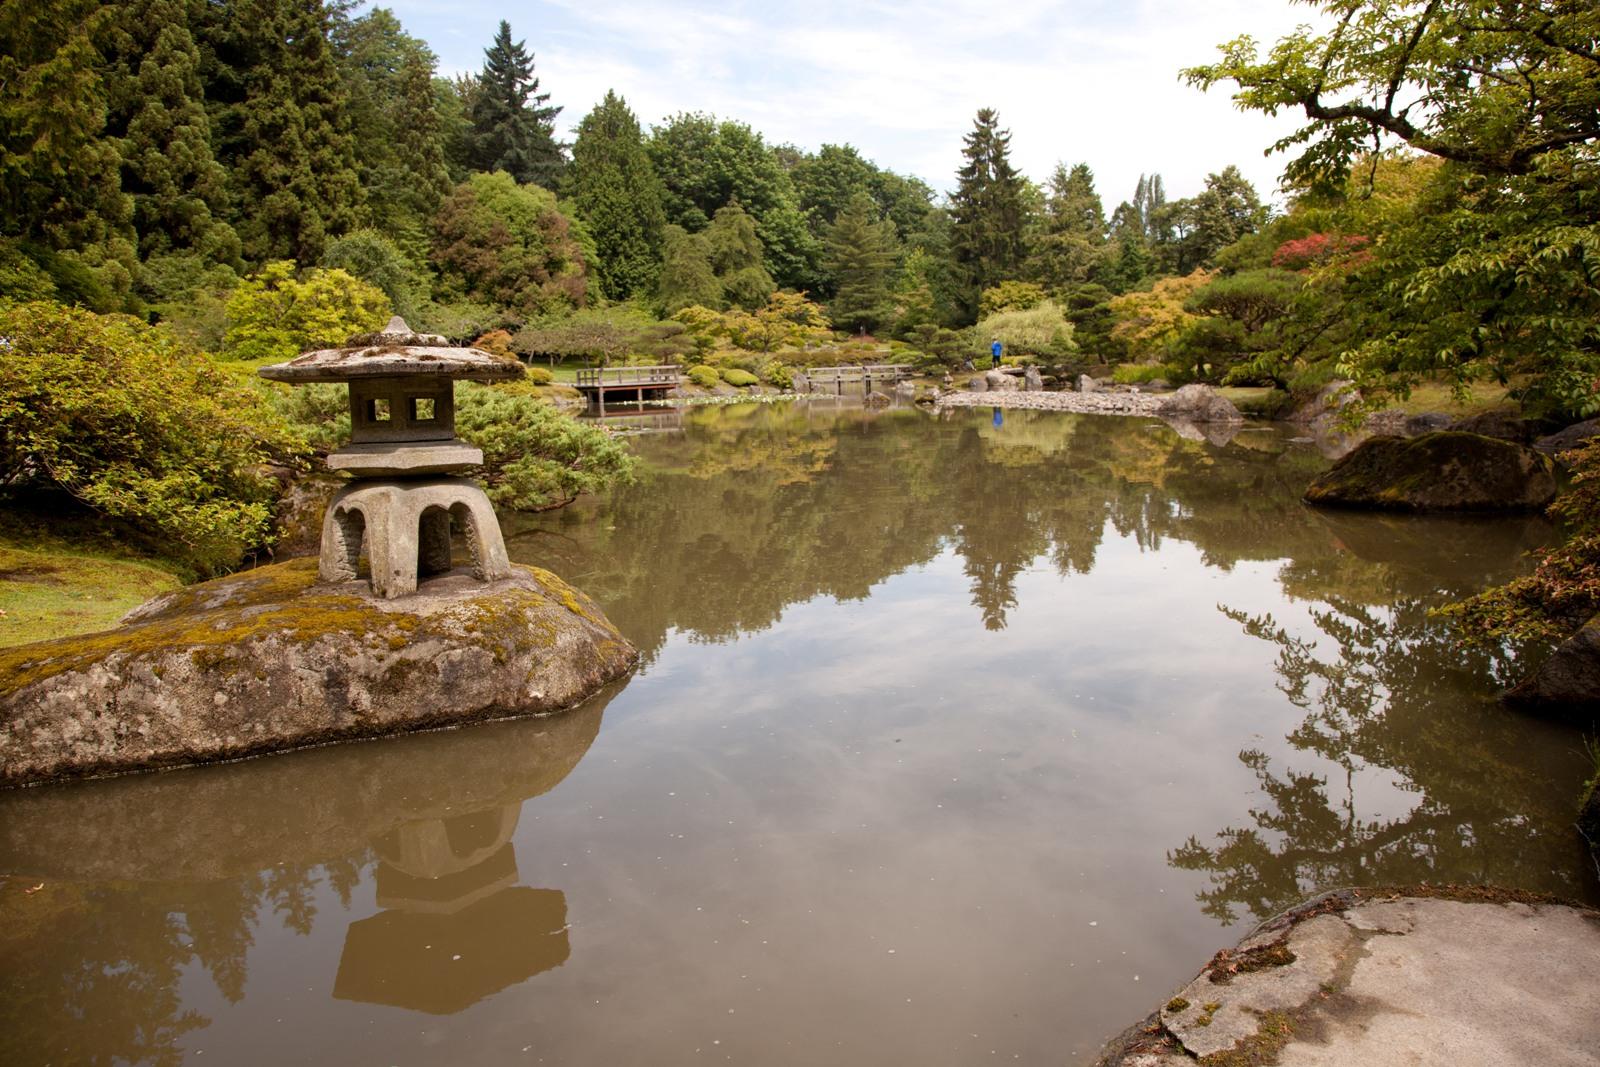 Photos: Japanese Garden at Seattle Arboretum - Paul S. Randal